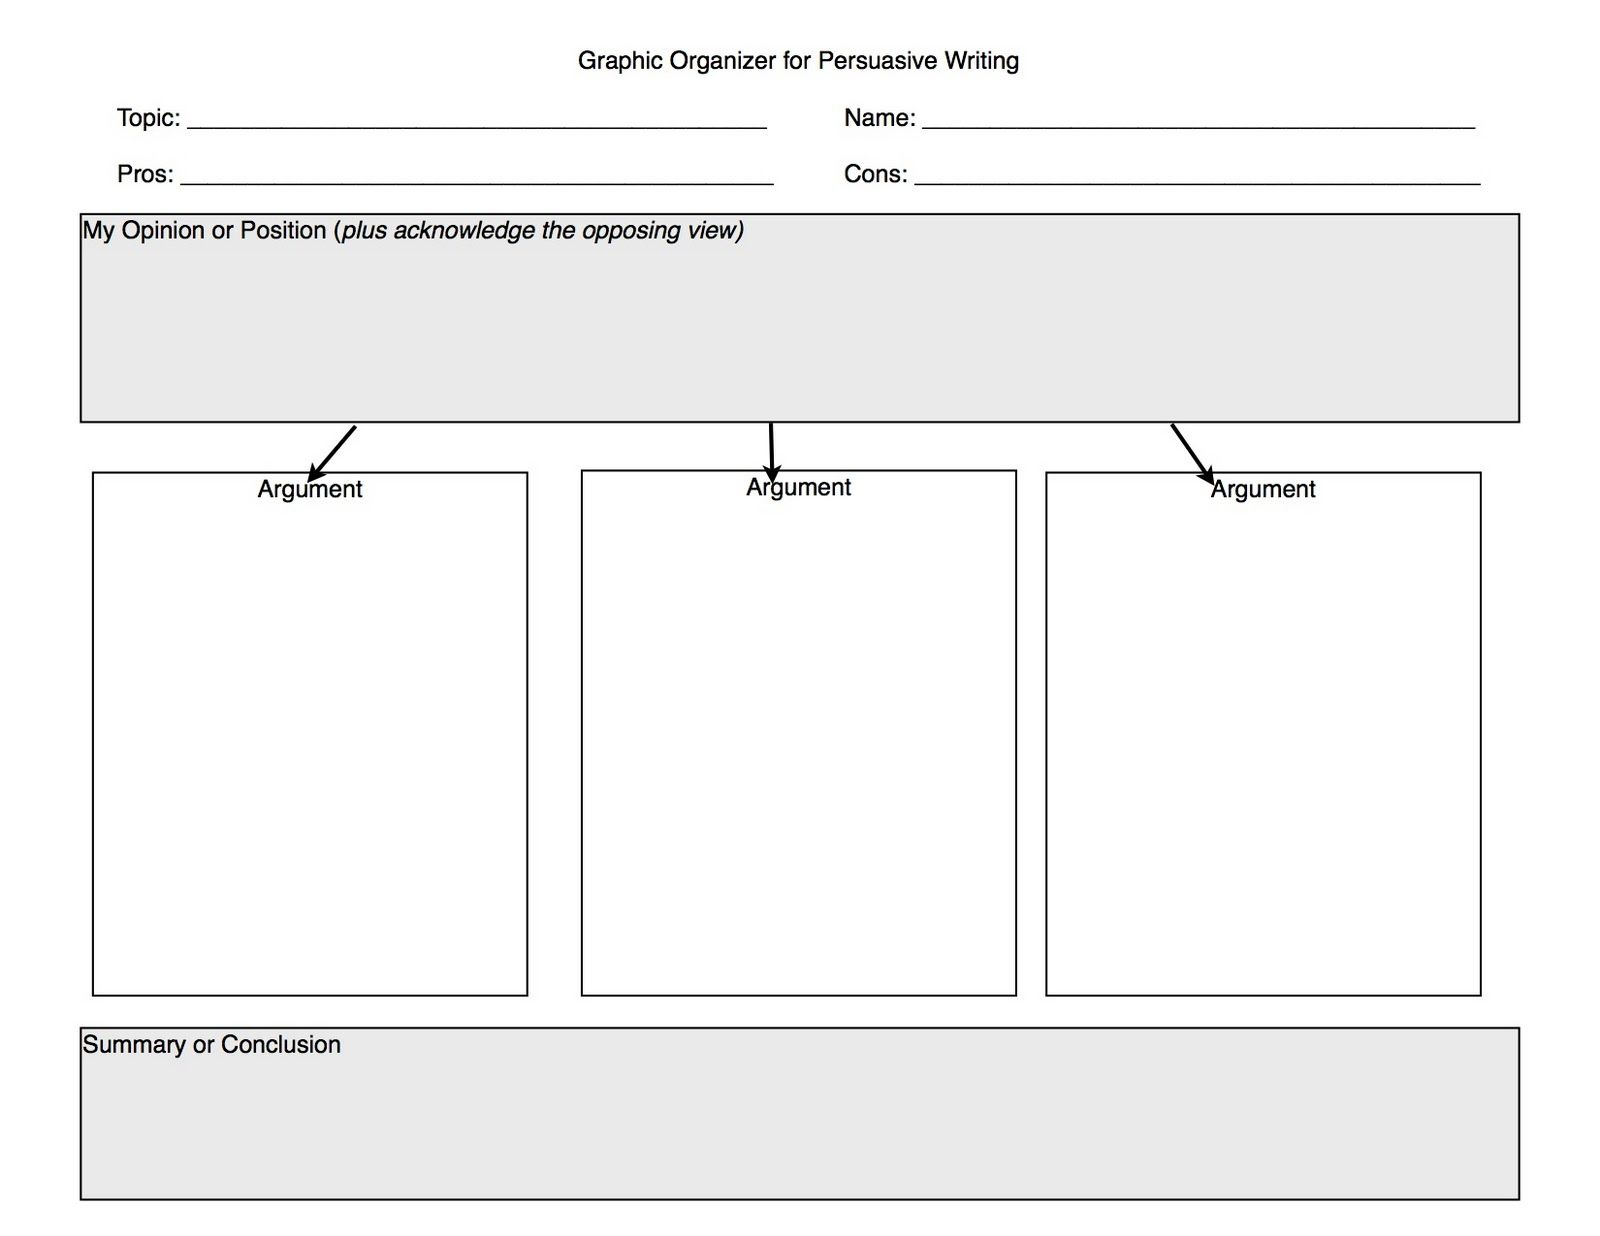 017 Five Paragraph Essay Graphic Organizer Wonderful 5 Middle School Pdf Organizer-hamburger Full